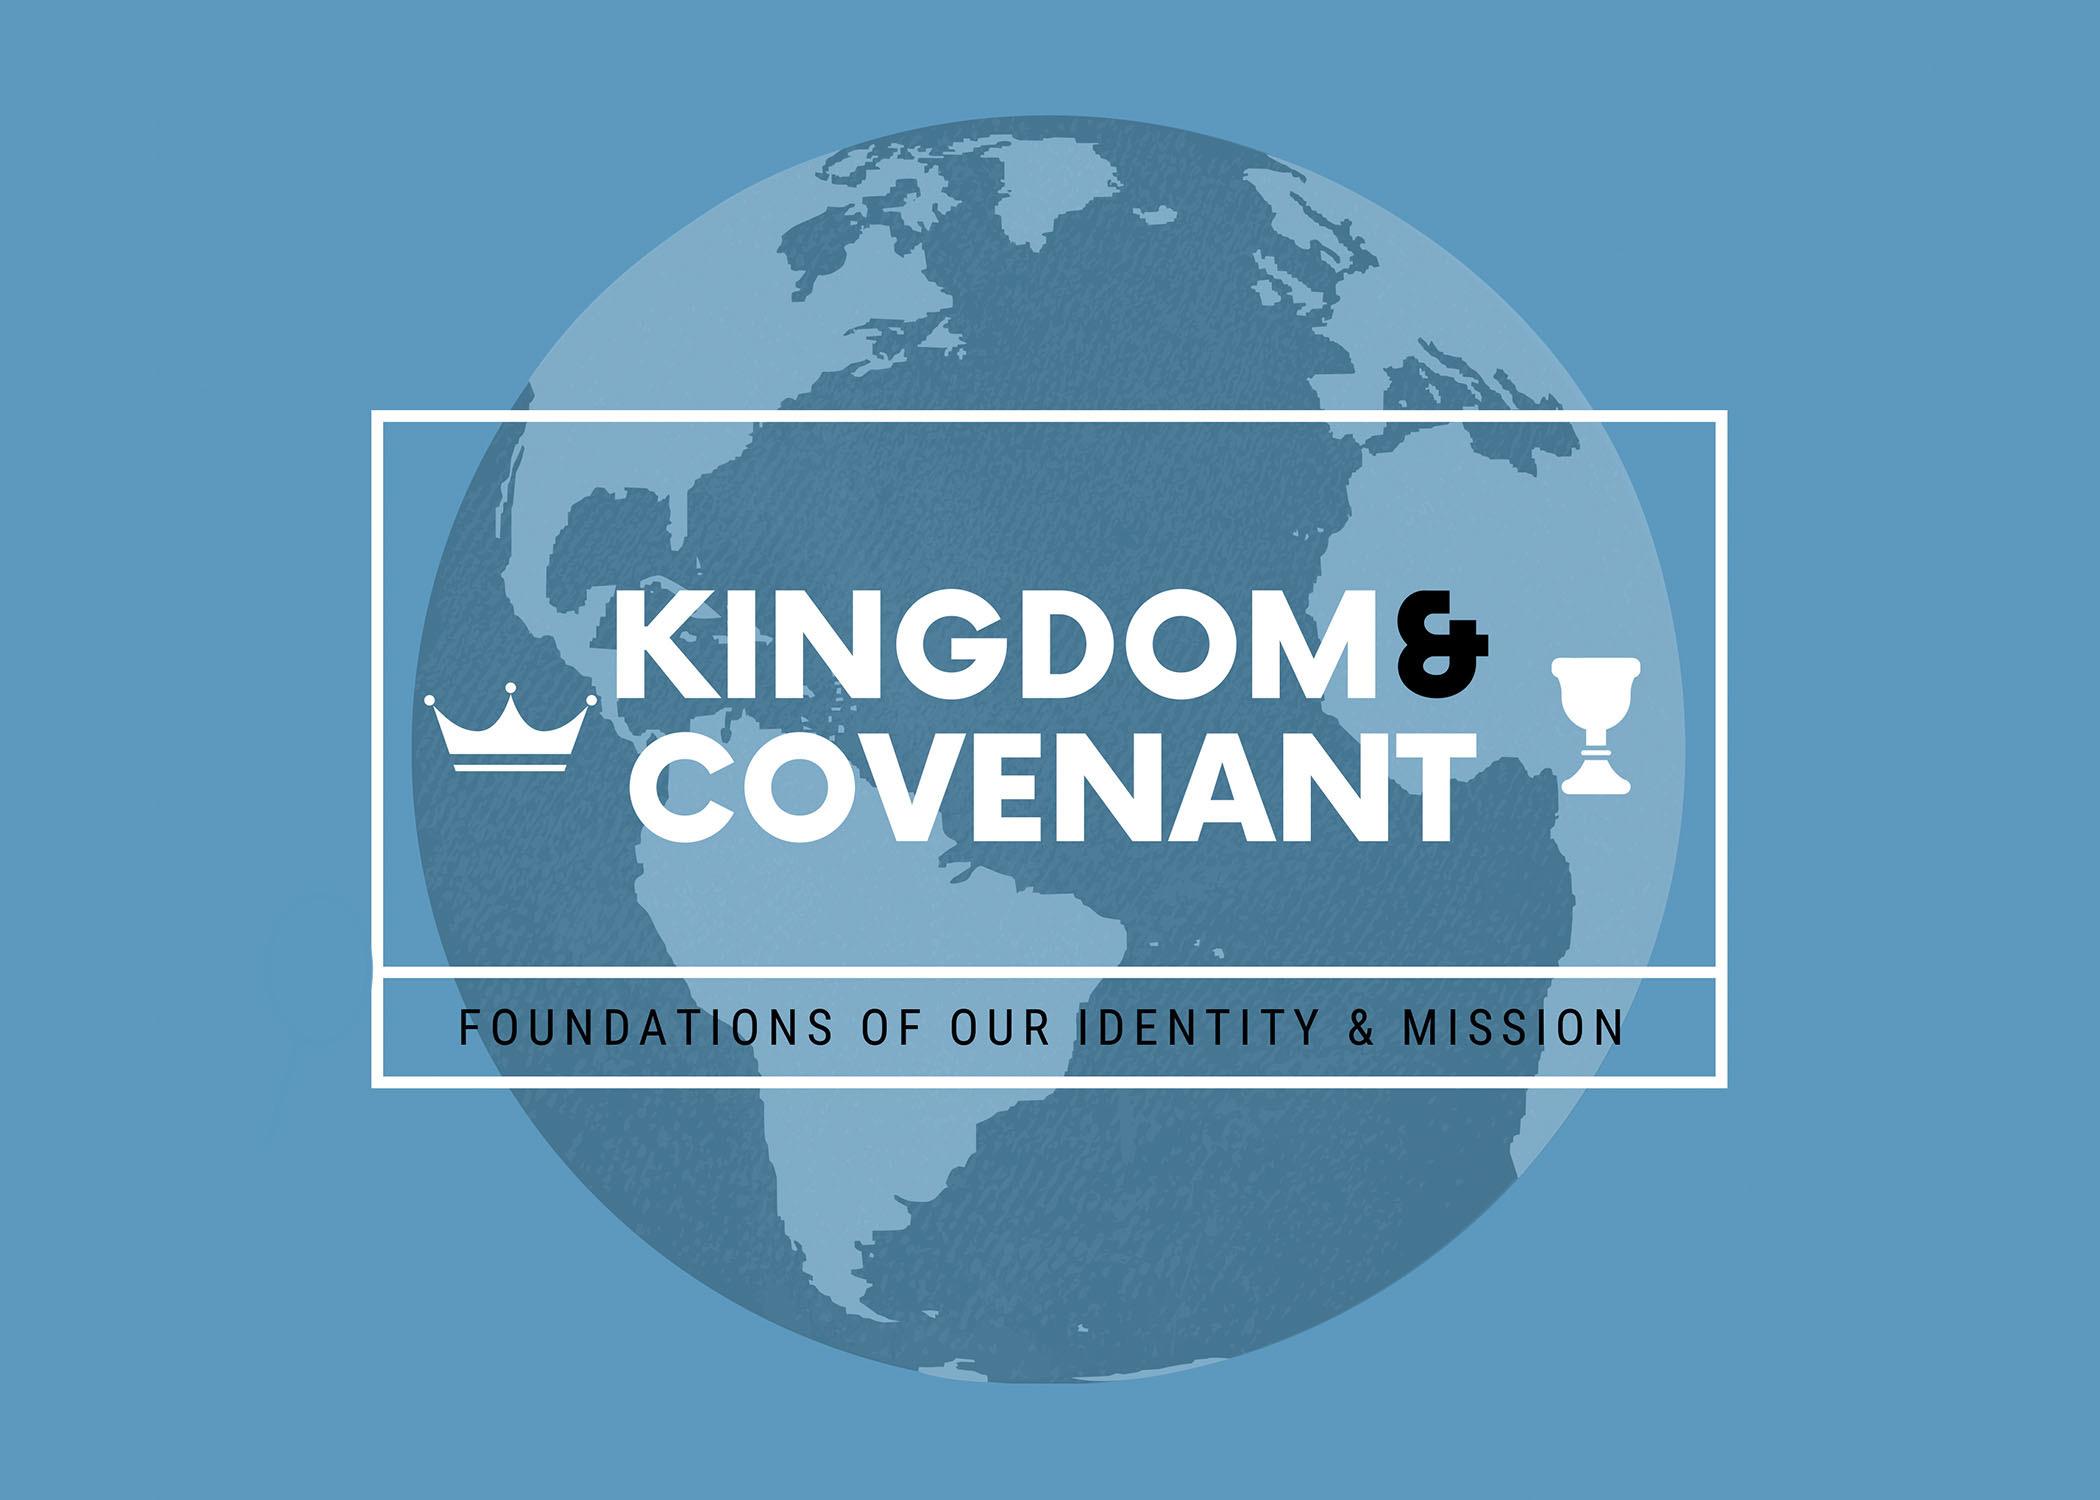 Kingdom & Covenant Image 2.jpeg